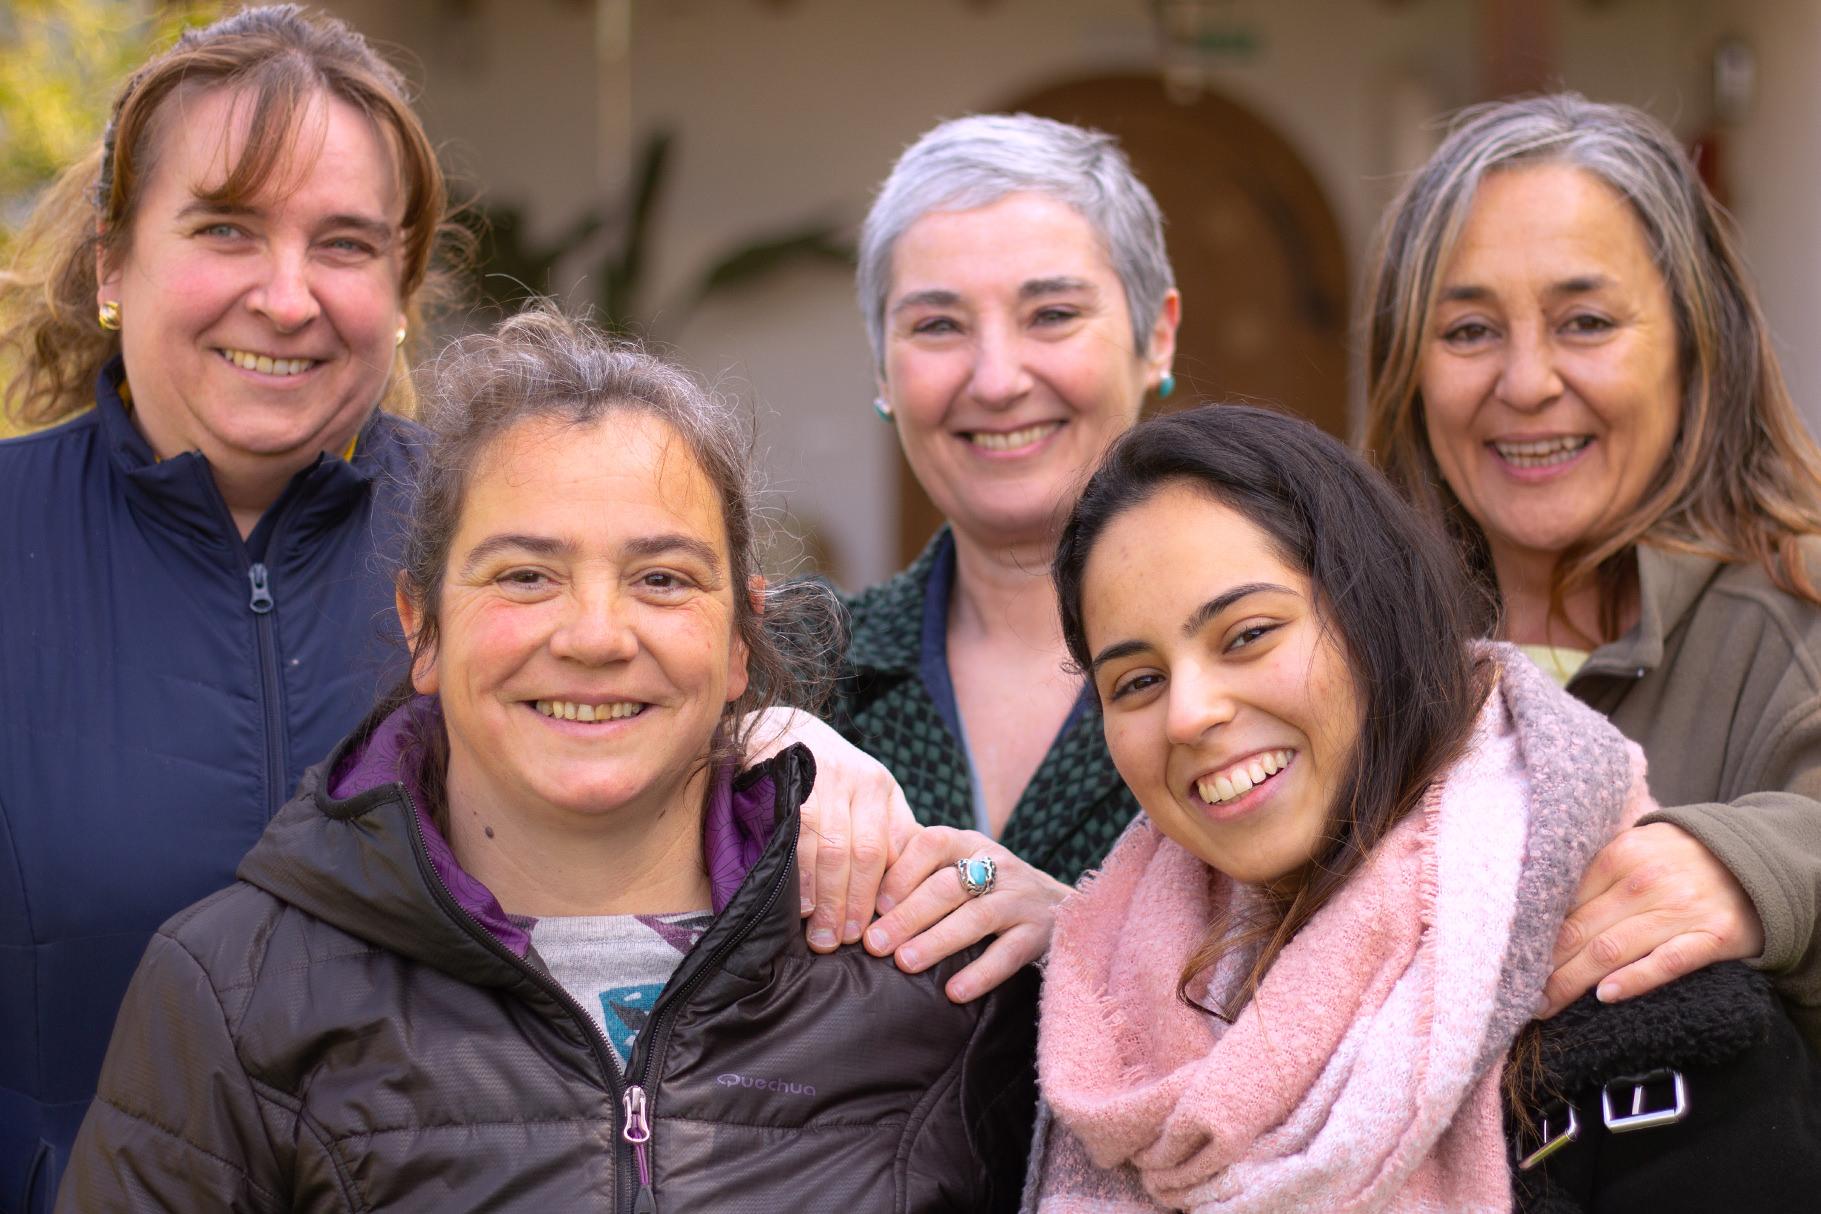 Maite Sanz Fernández, Silveria Hadjerioua, Tere De Carlos Lander, Susana Arraiza Azcona, Rania El Hajjy, Jenny Edith Munive Cárdenas